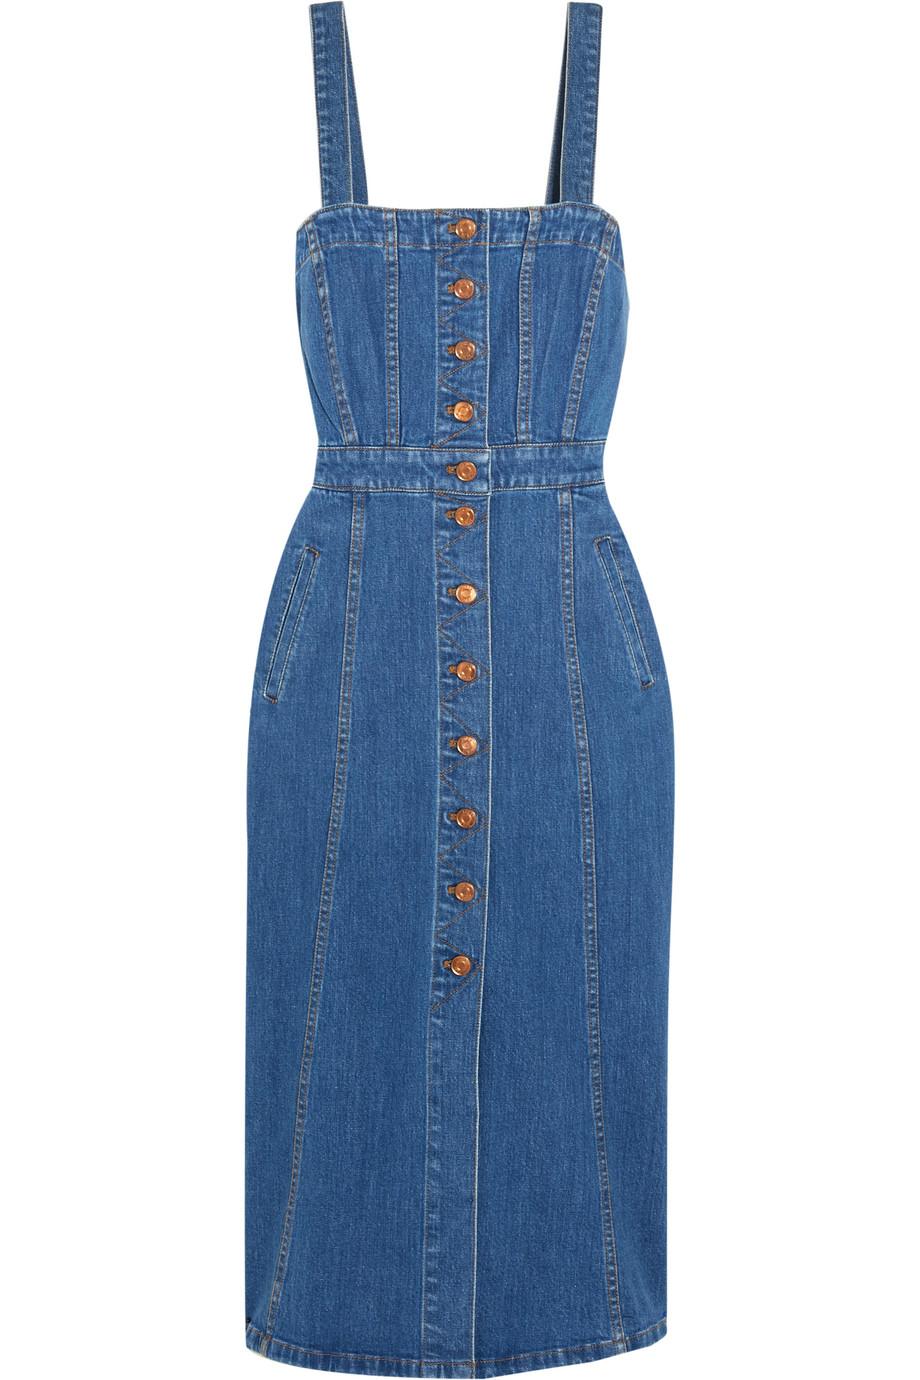 J.Crew Stretch-Denim Midi Dress, Mid Denim, Women's, Size: 10